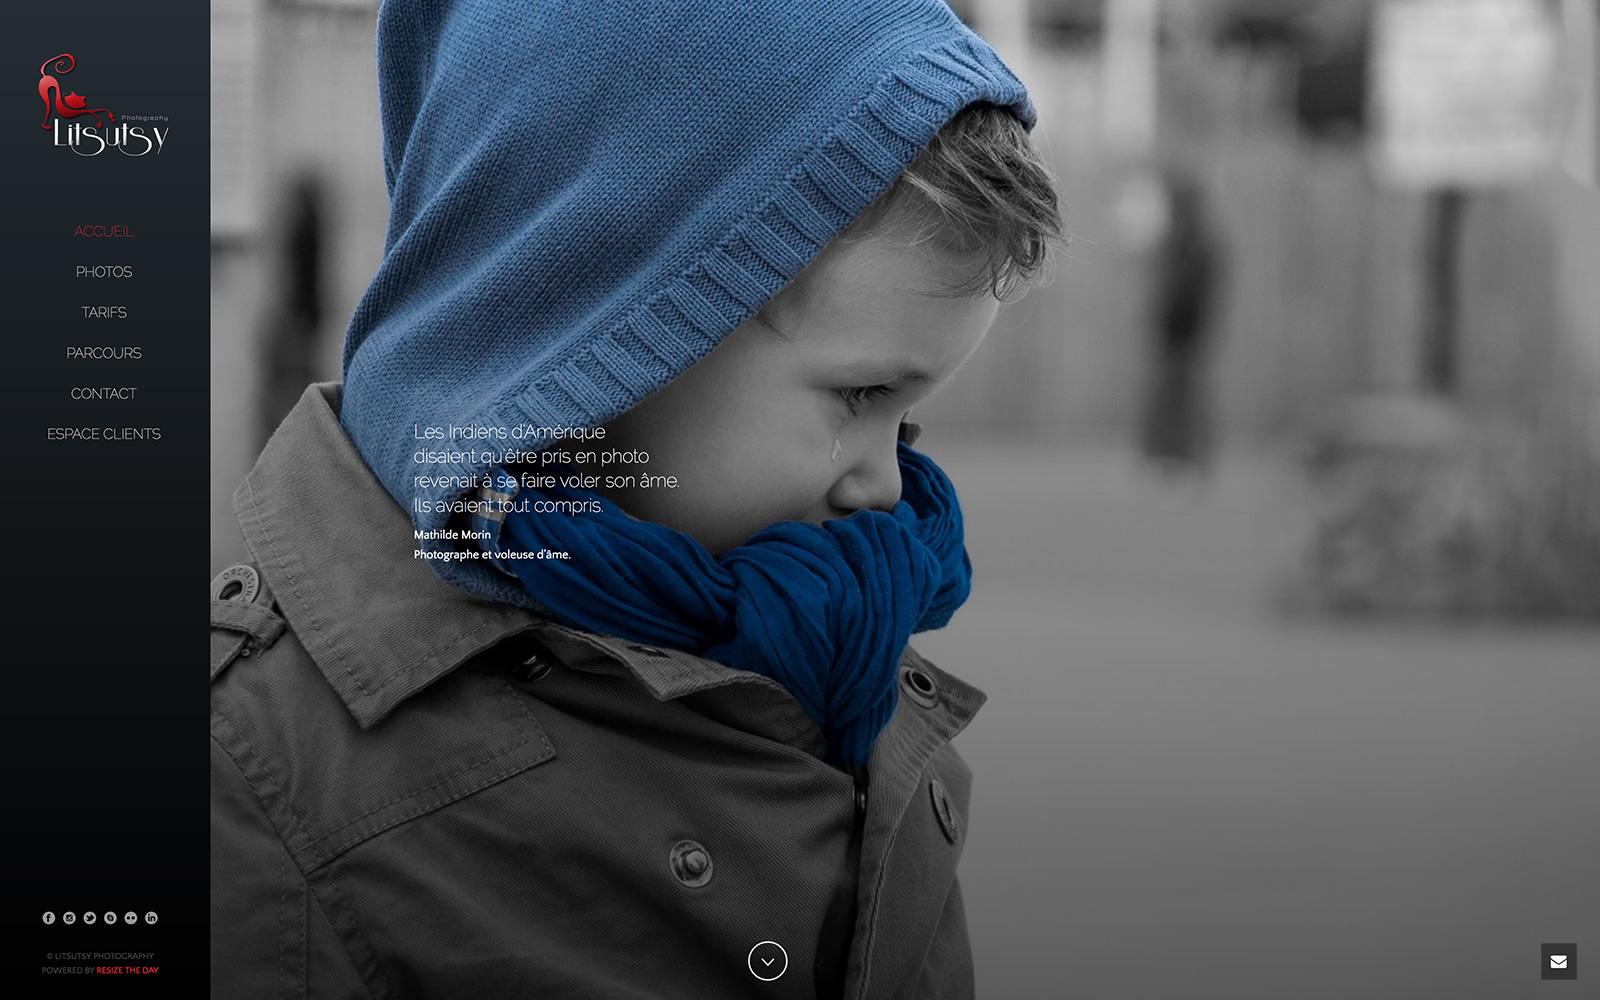 Litsutsy Photography